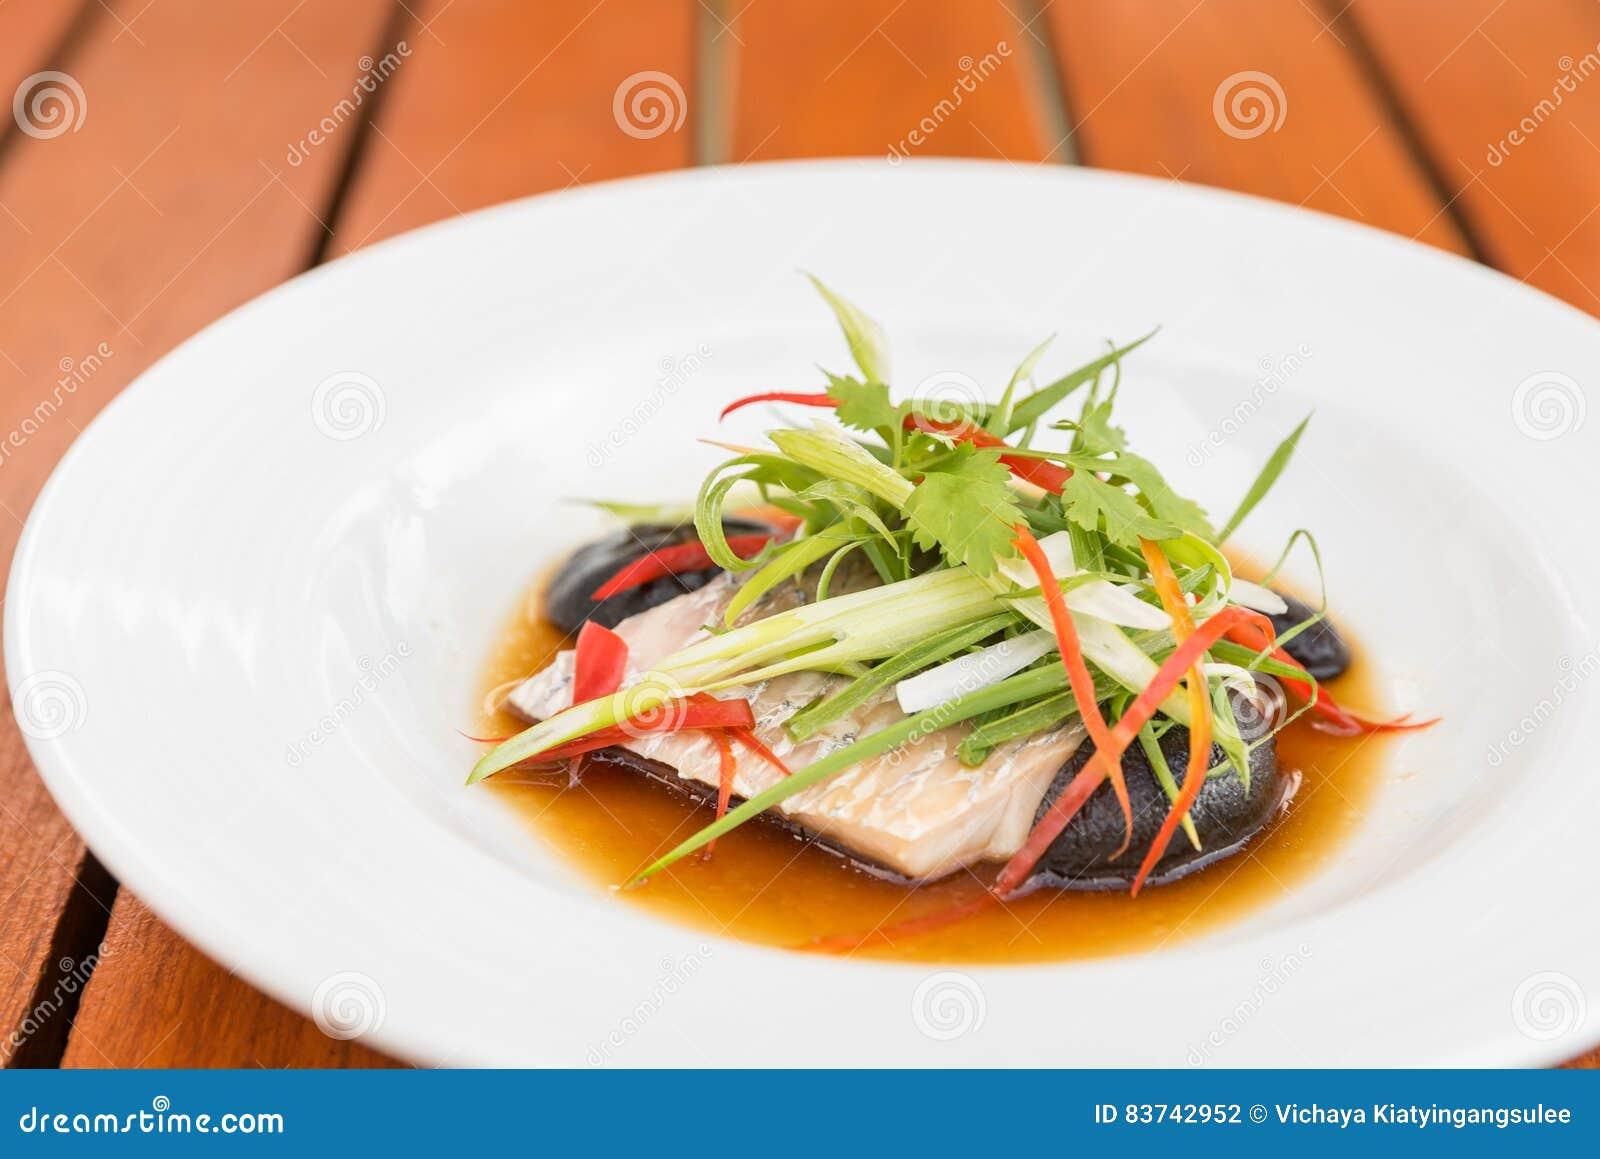 Steamed sea bass fillet